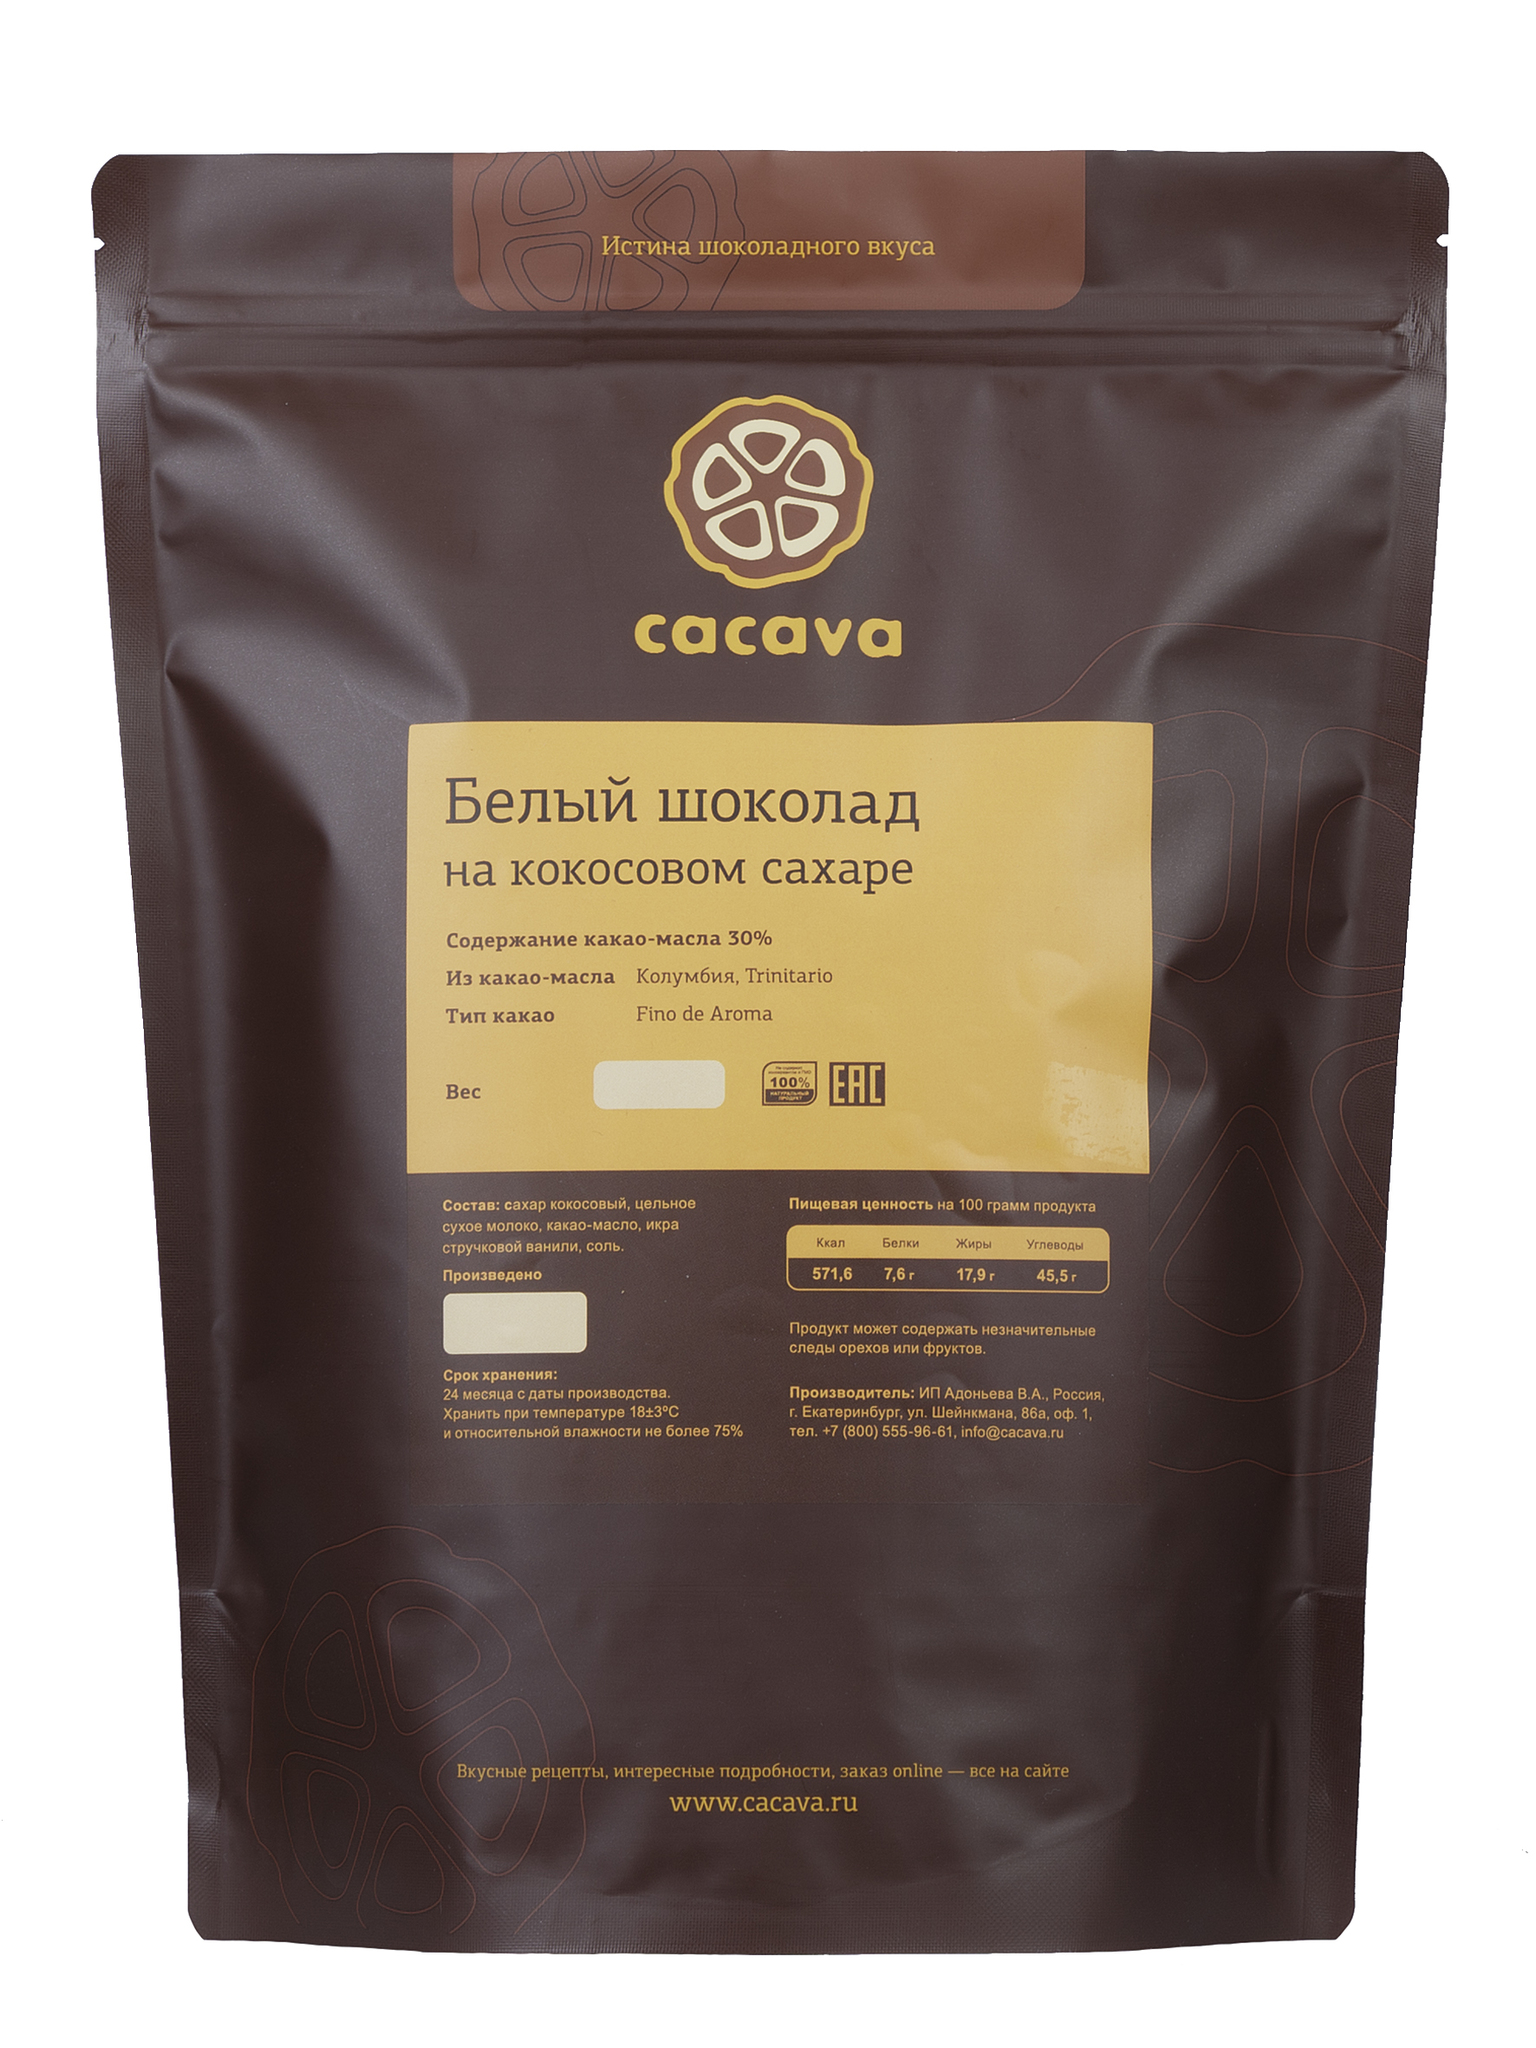 Белый шоколад на кокосовом сахаре, упаковка 1 кг